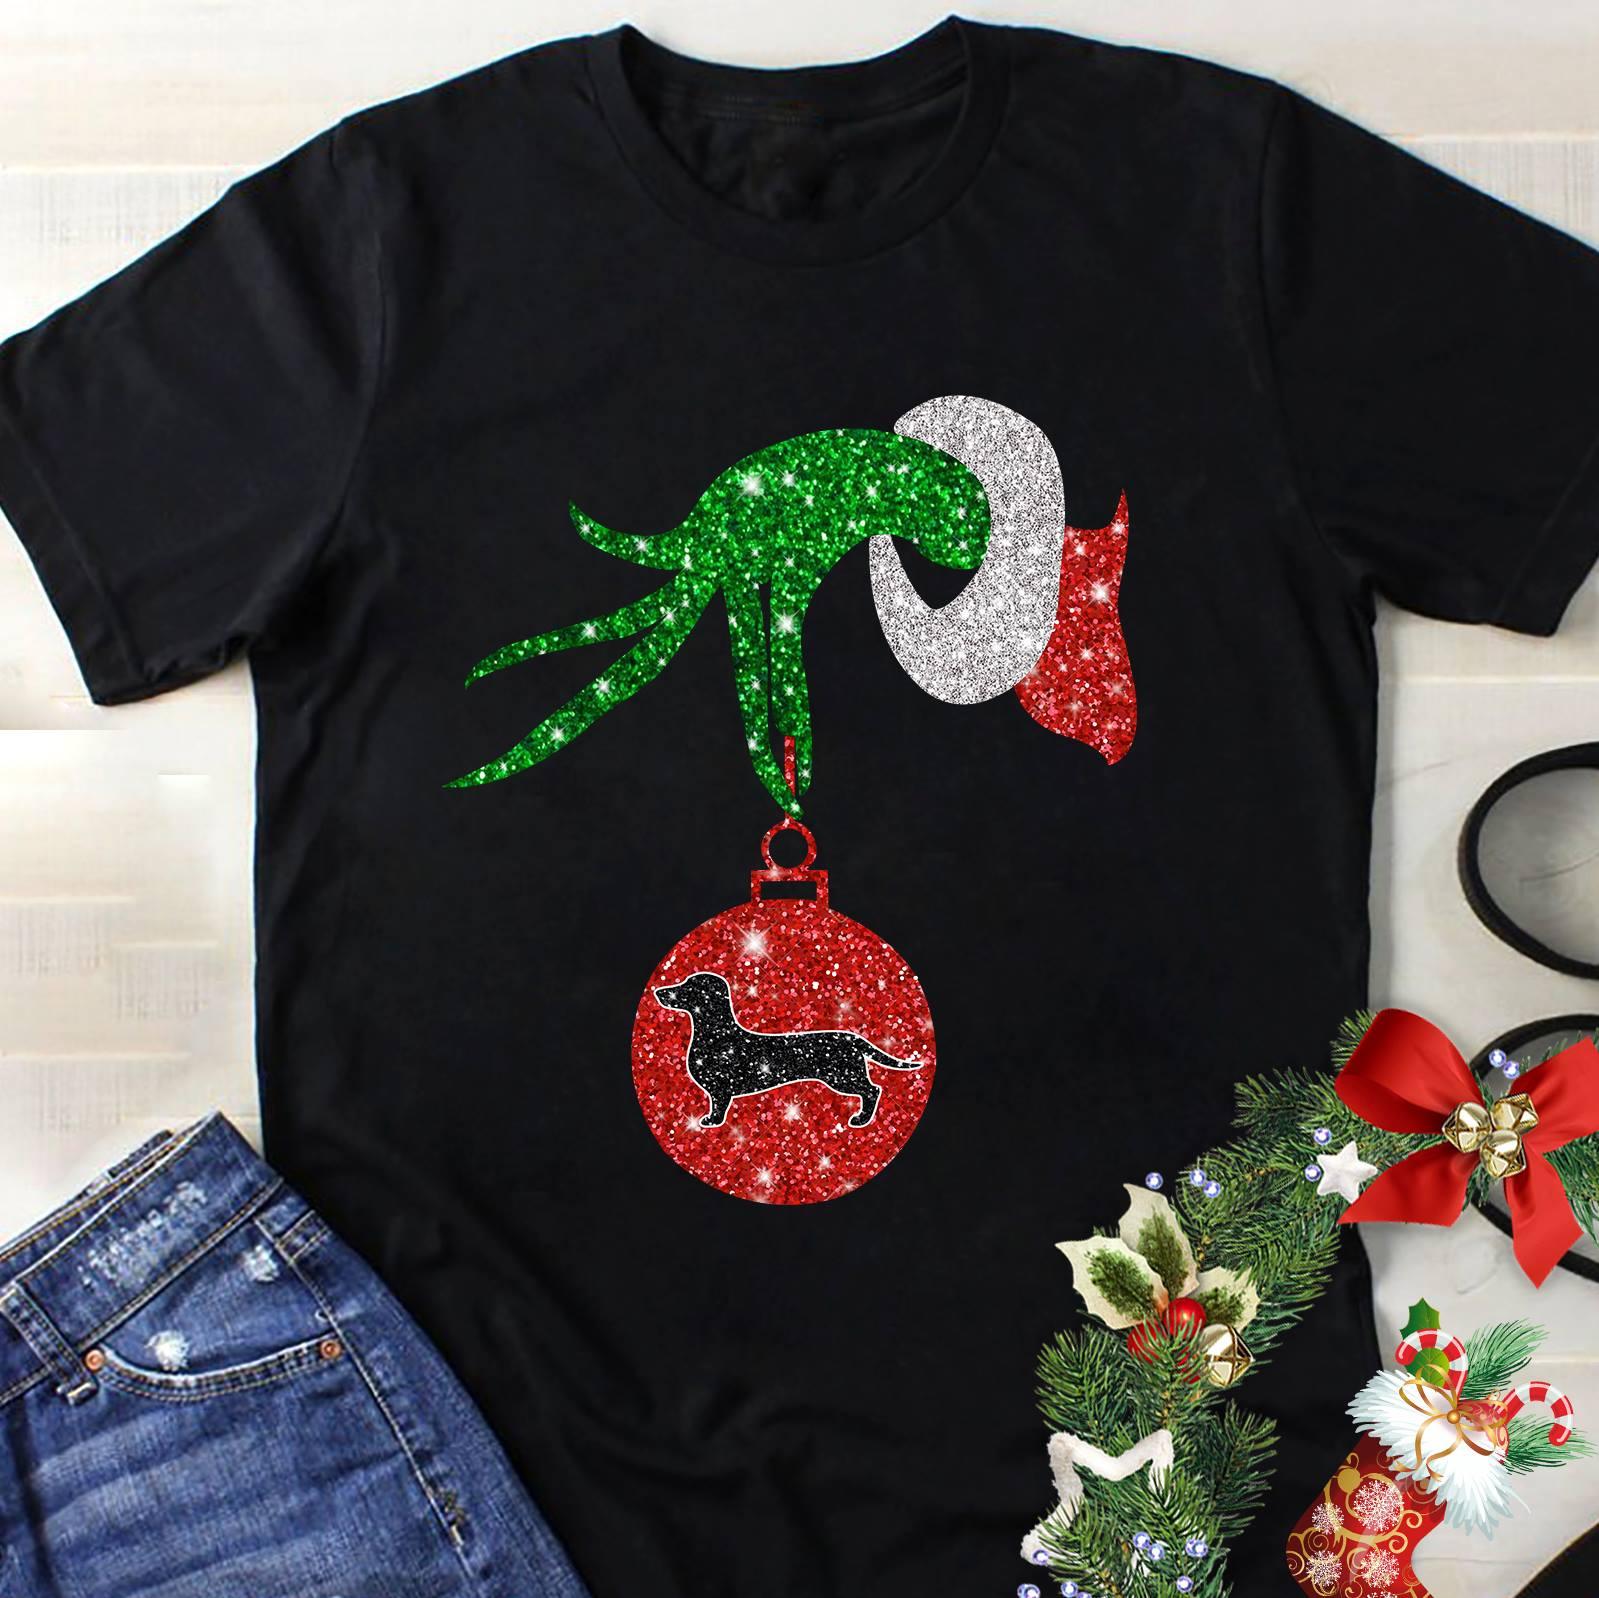 The Grinch holding a dachshund ornament shirt